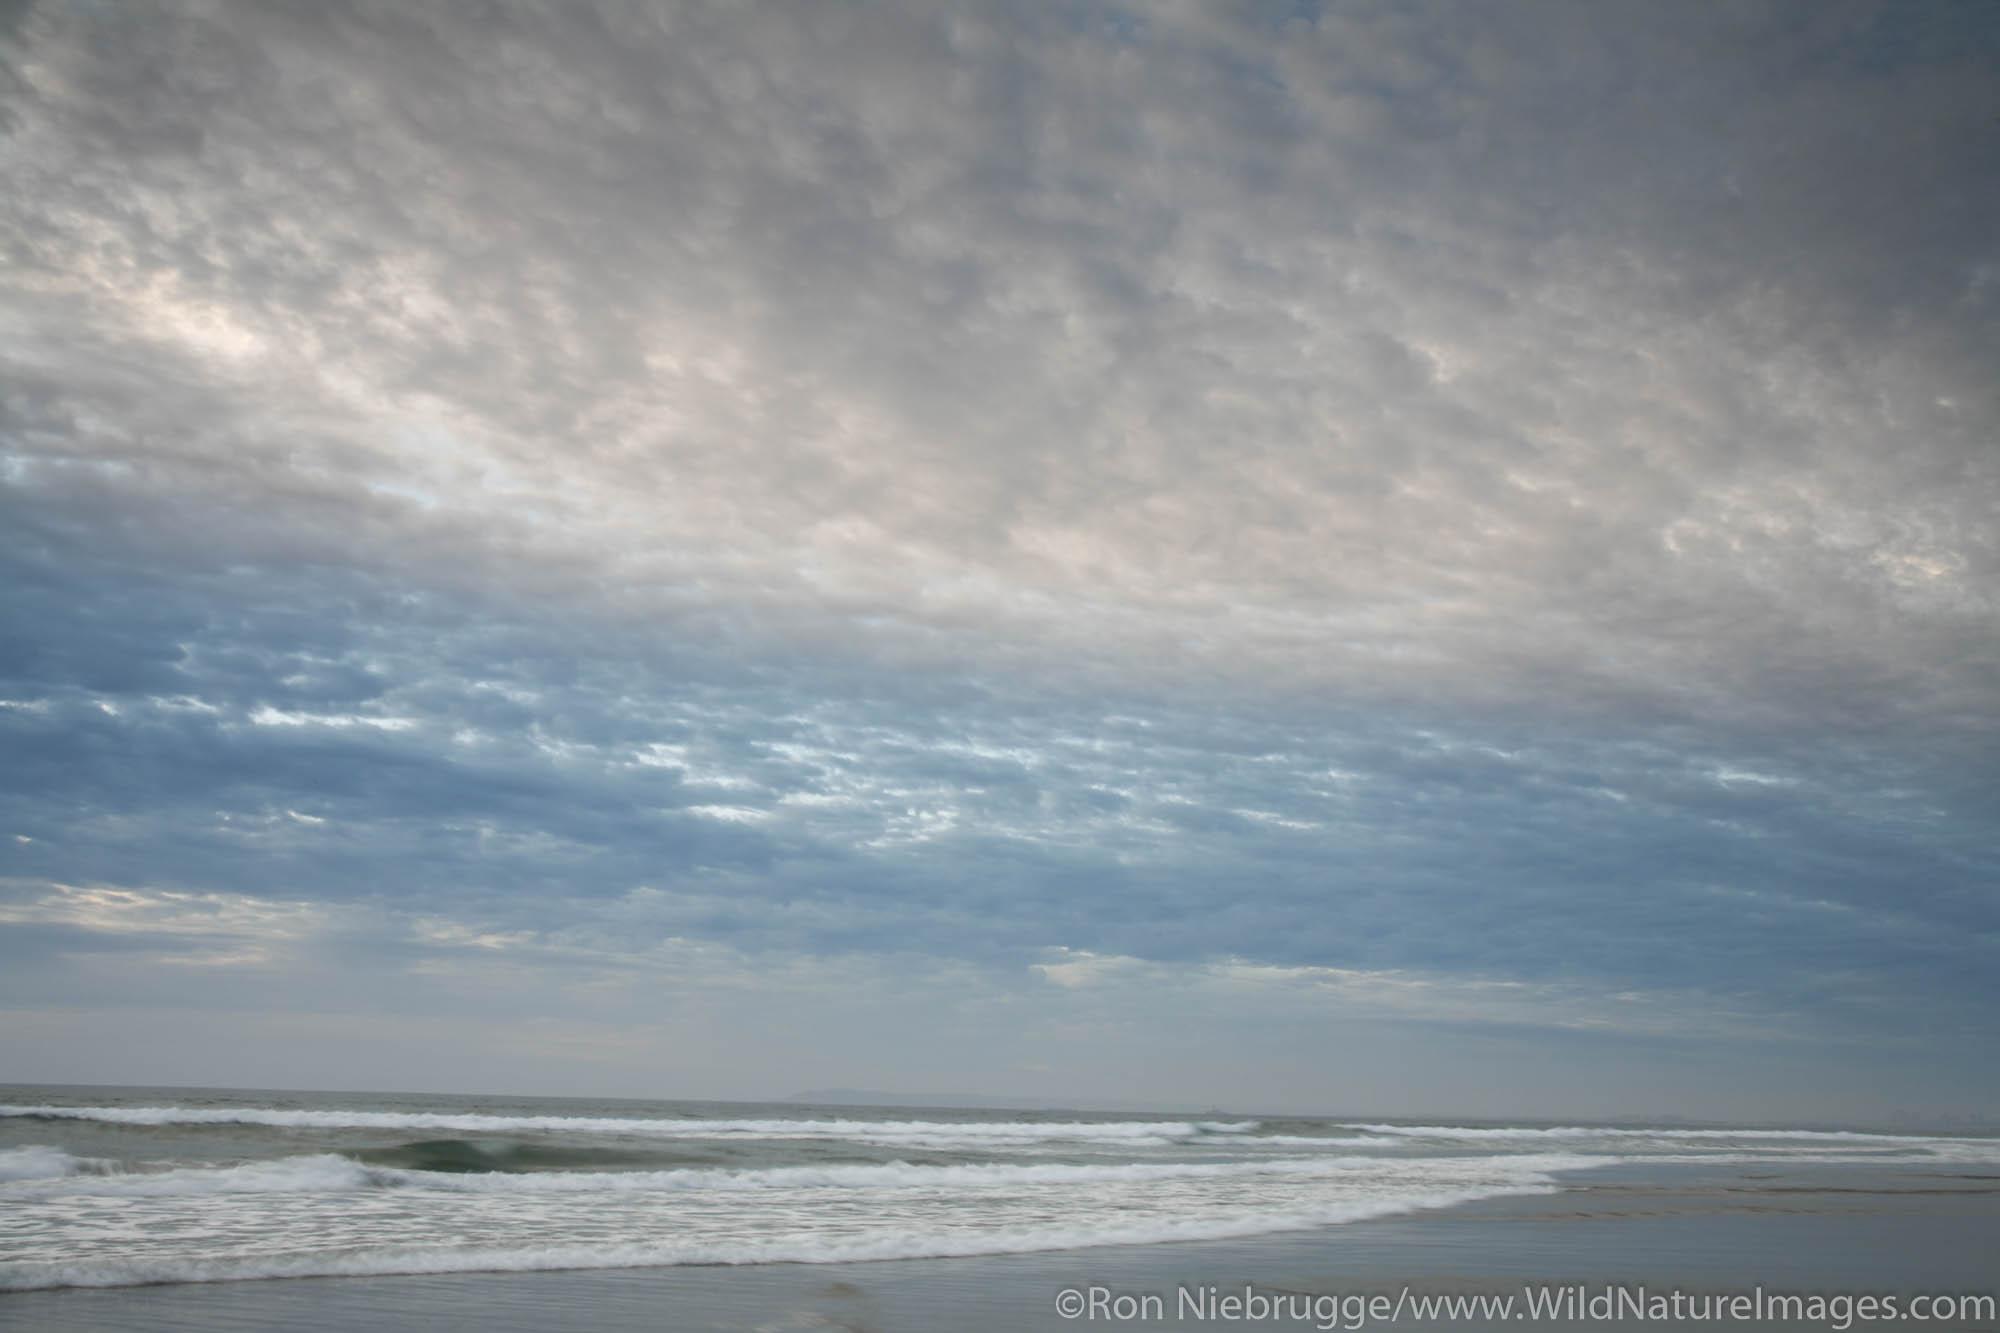 Clouds over Imperial Beach near the Municipal Pier, San Diego County, California.